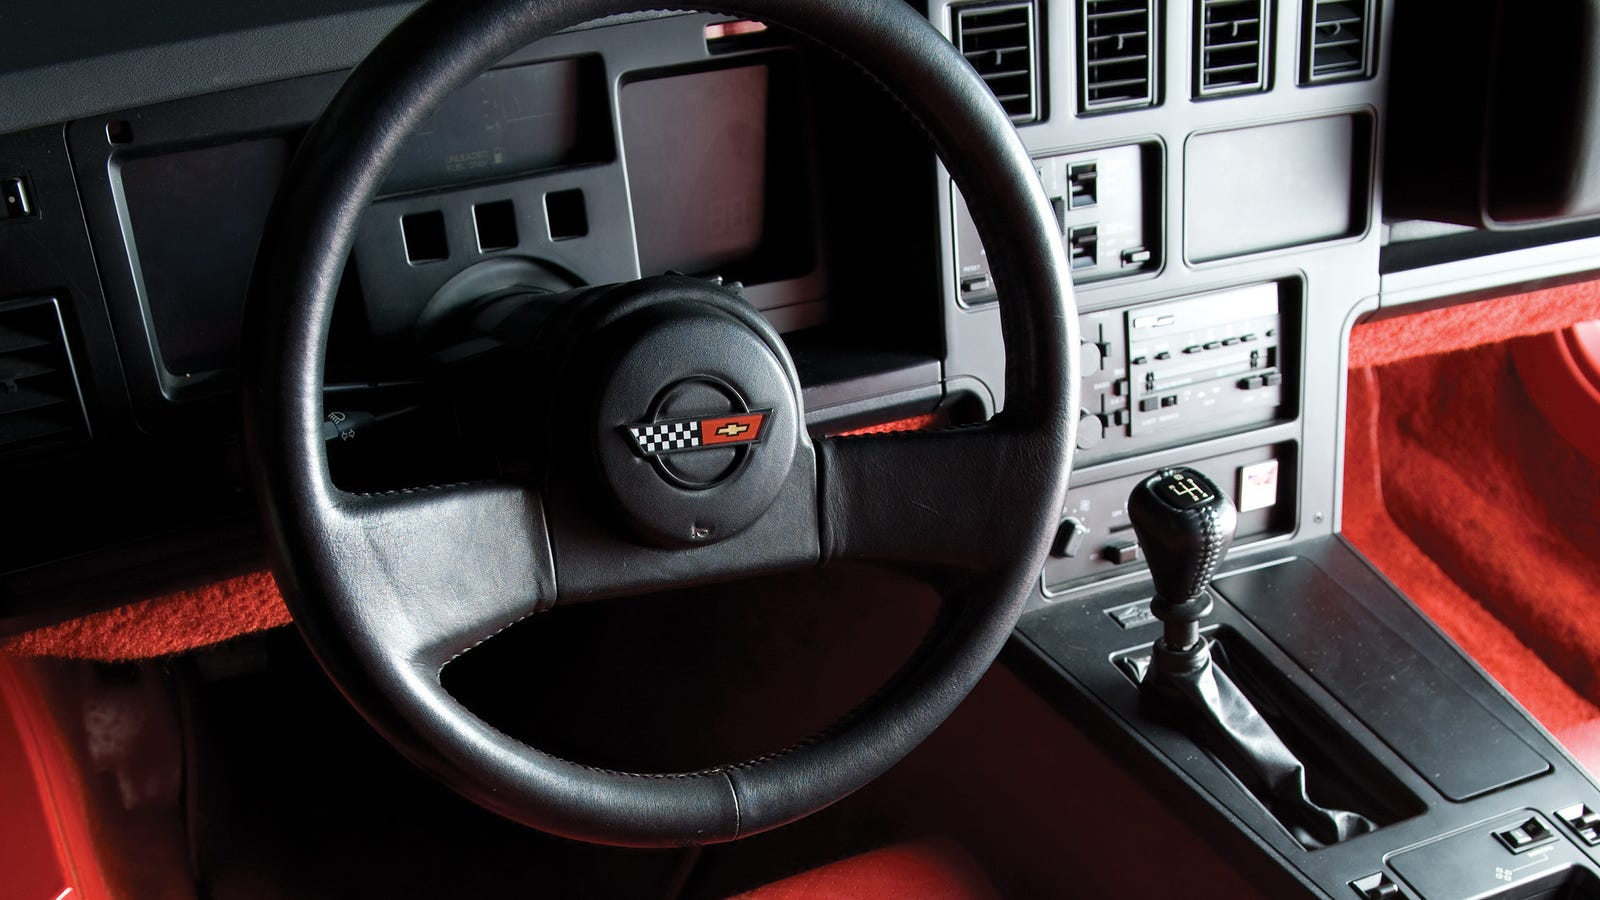 The Chevrolet Corvette C4's 'Doug Nash 4+3' Manual